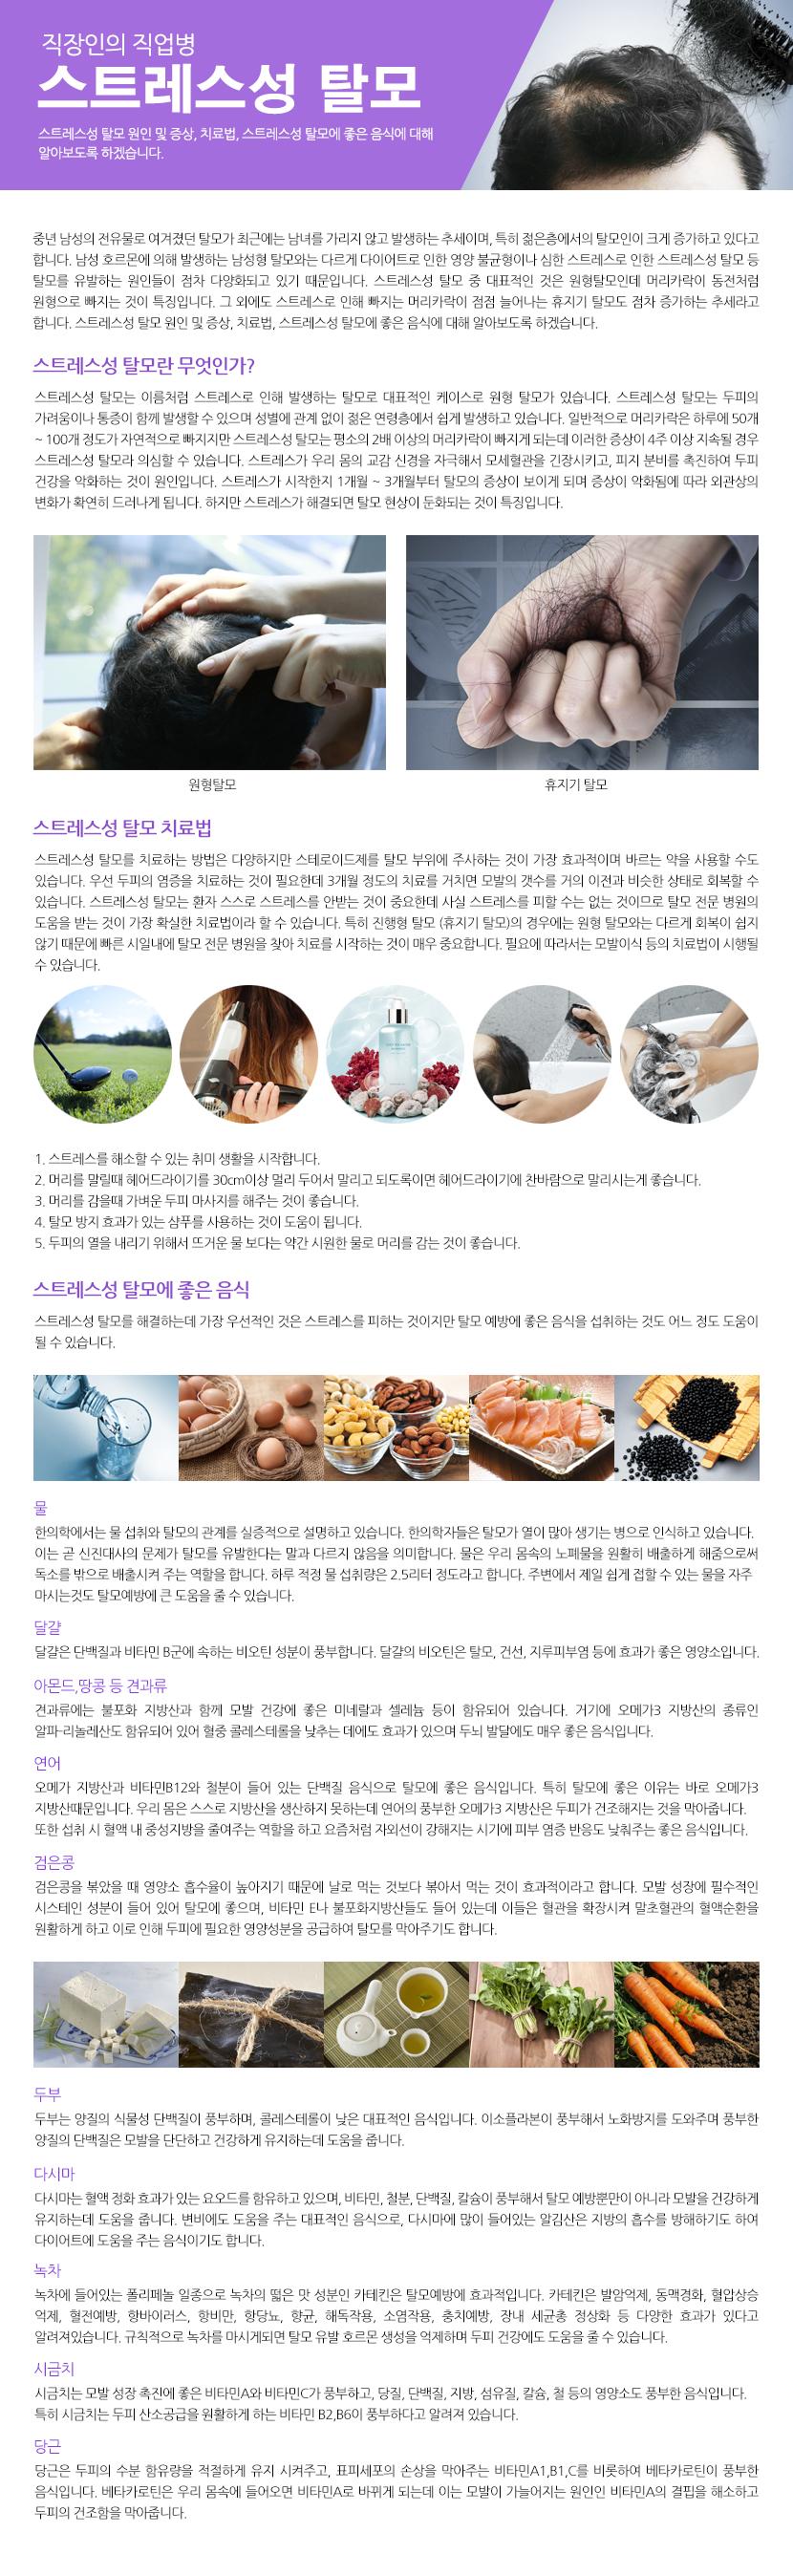 2009_mdh_05.jpg